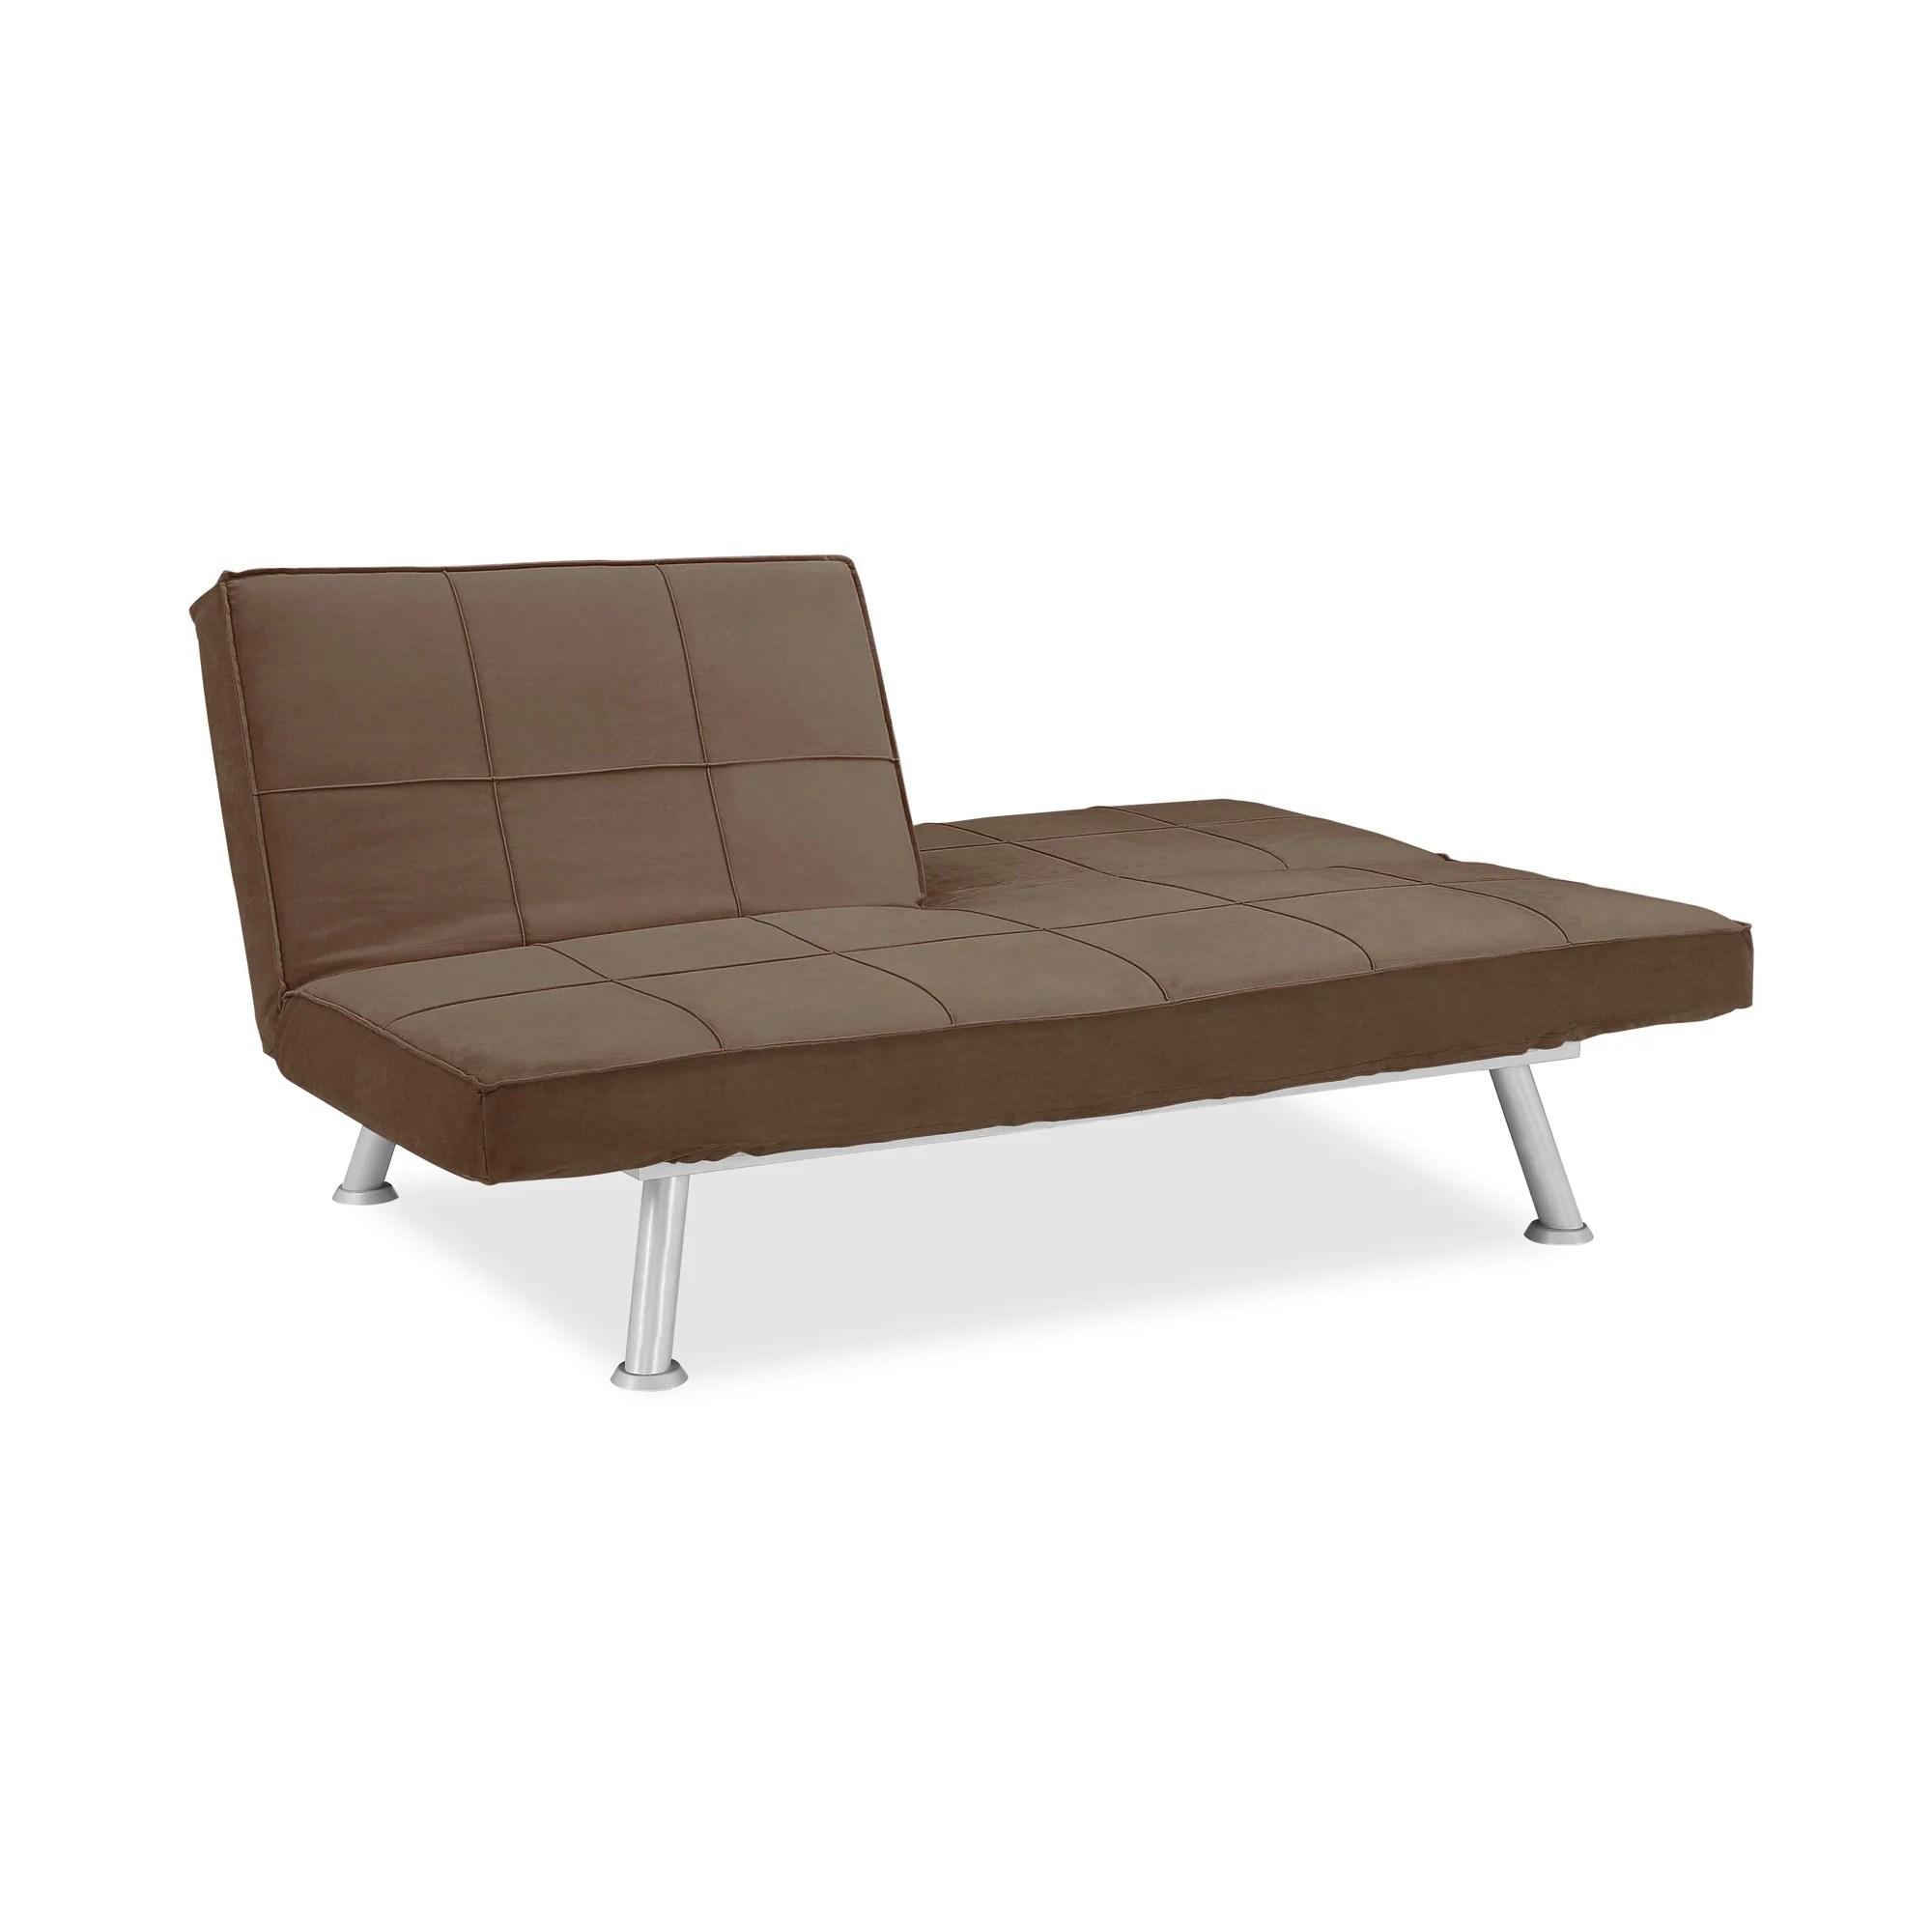 newport sofa convertible bed creations nz maxson java by serta lifestyle